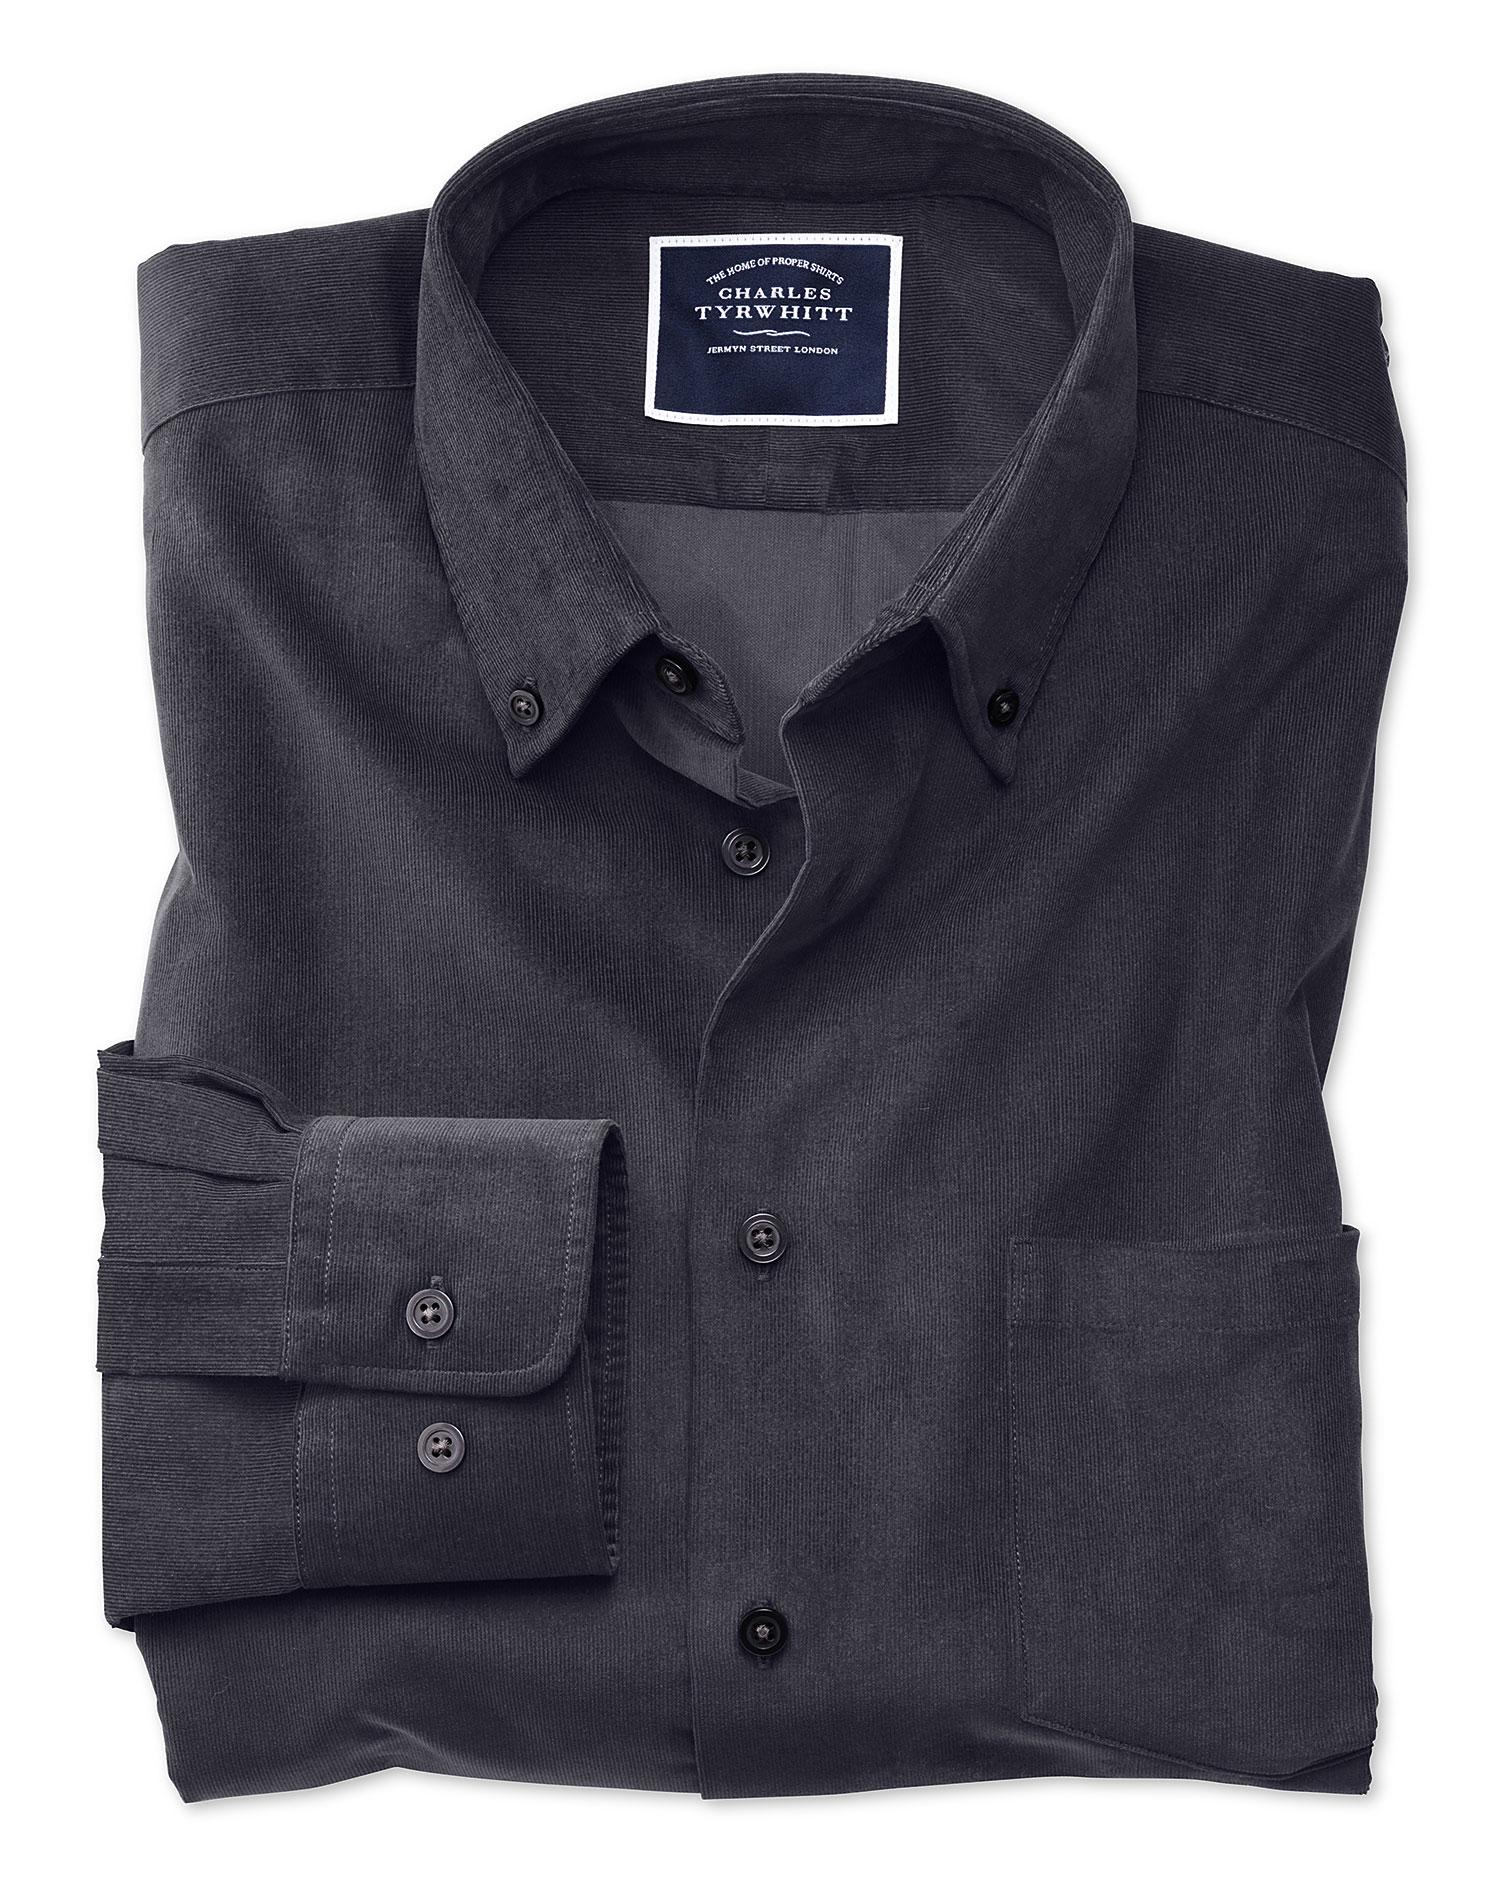 Extra Slim Fit Plain Charcoal Fine Corduroy Cotton Shirt Single Cuff Size XXL by Charles Tyrwhitt